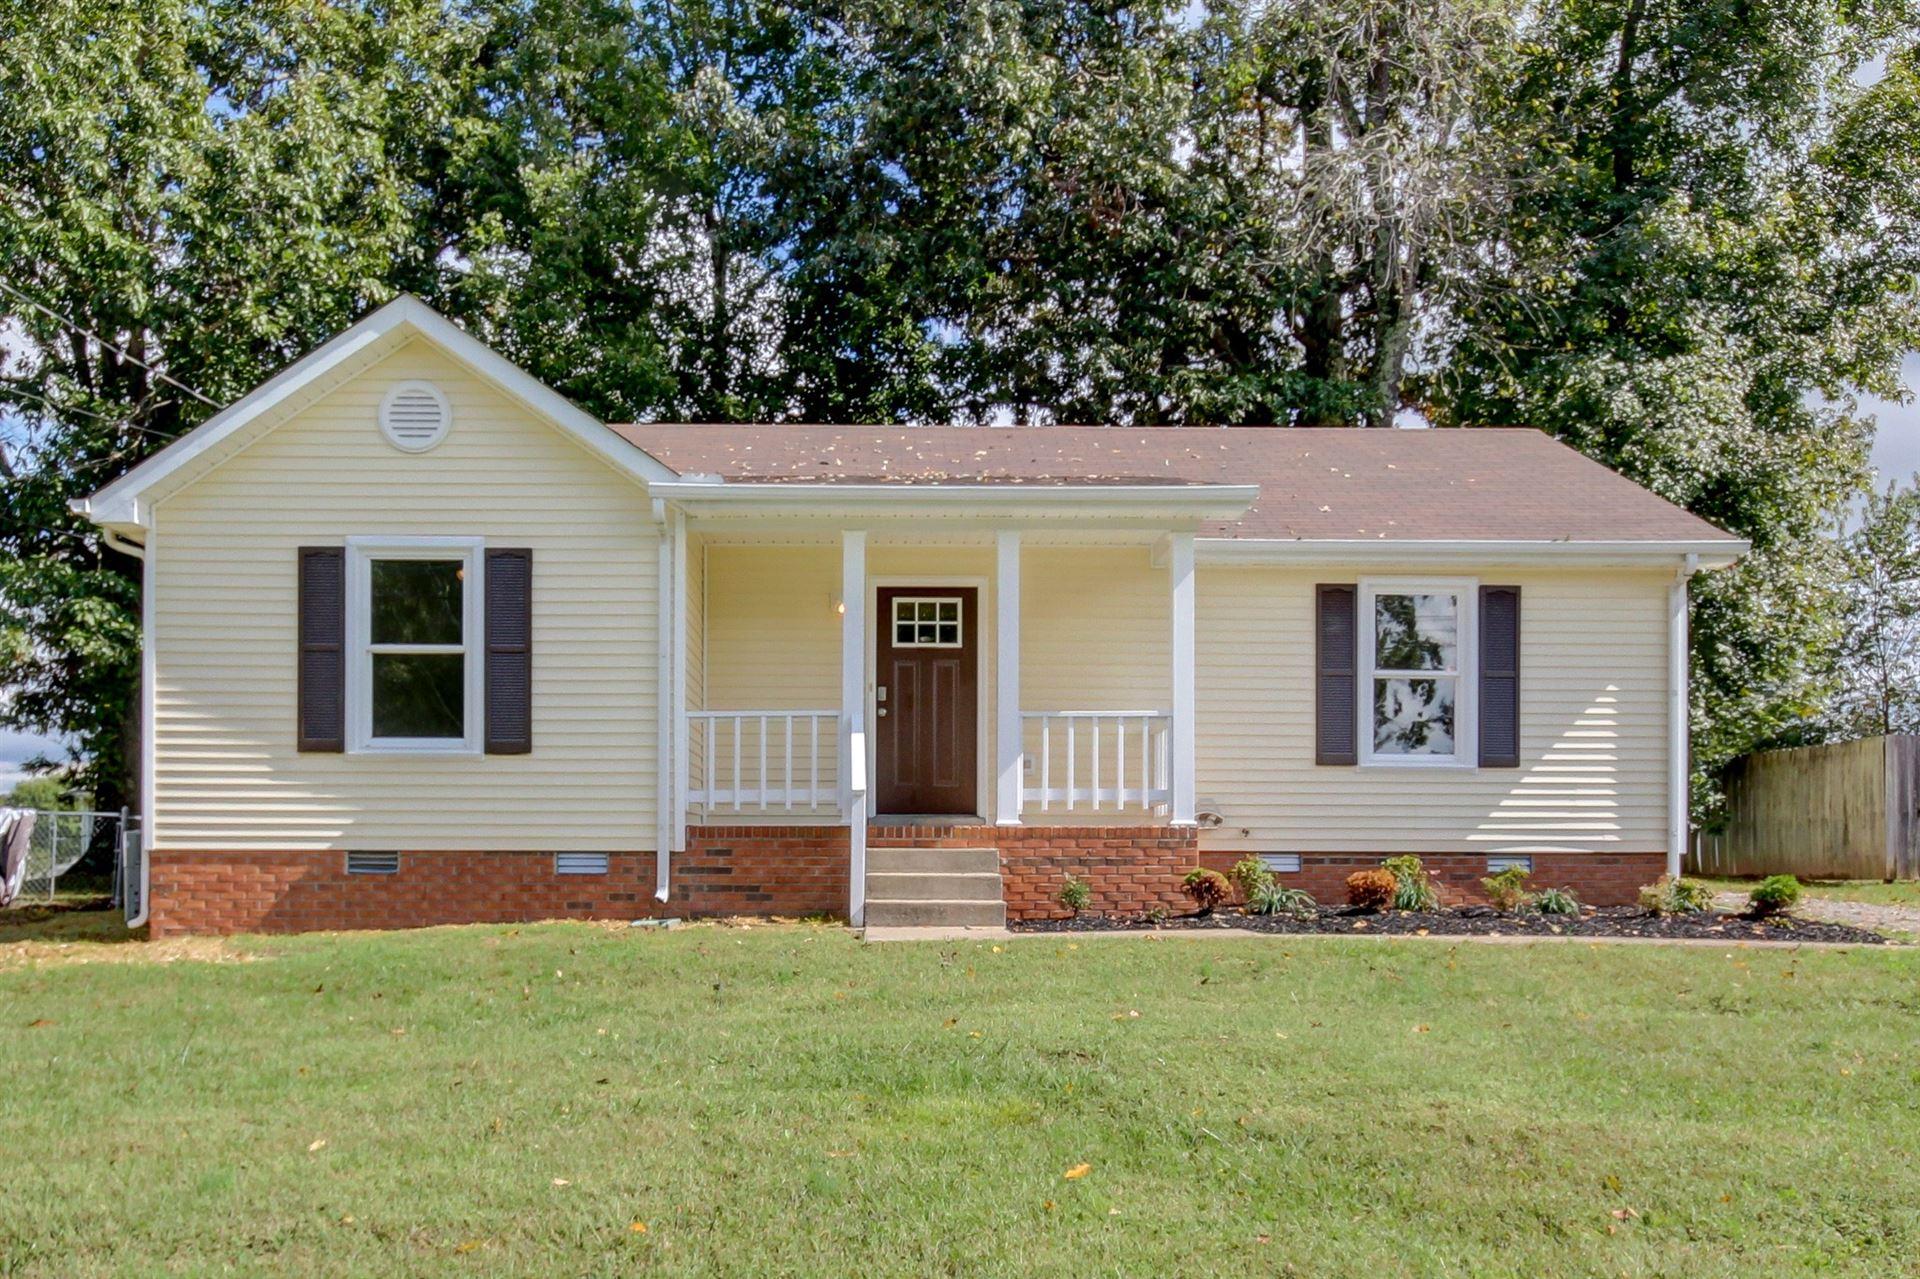 587 Garnet Dr, Clarksville, TN 37042 - MLS#: 2298285